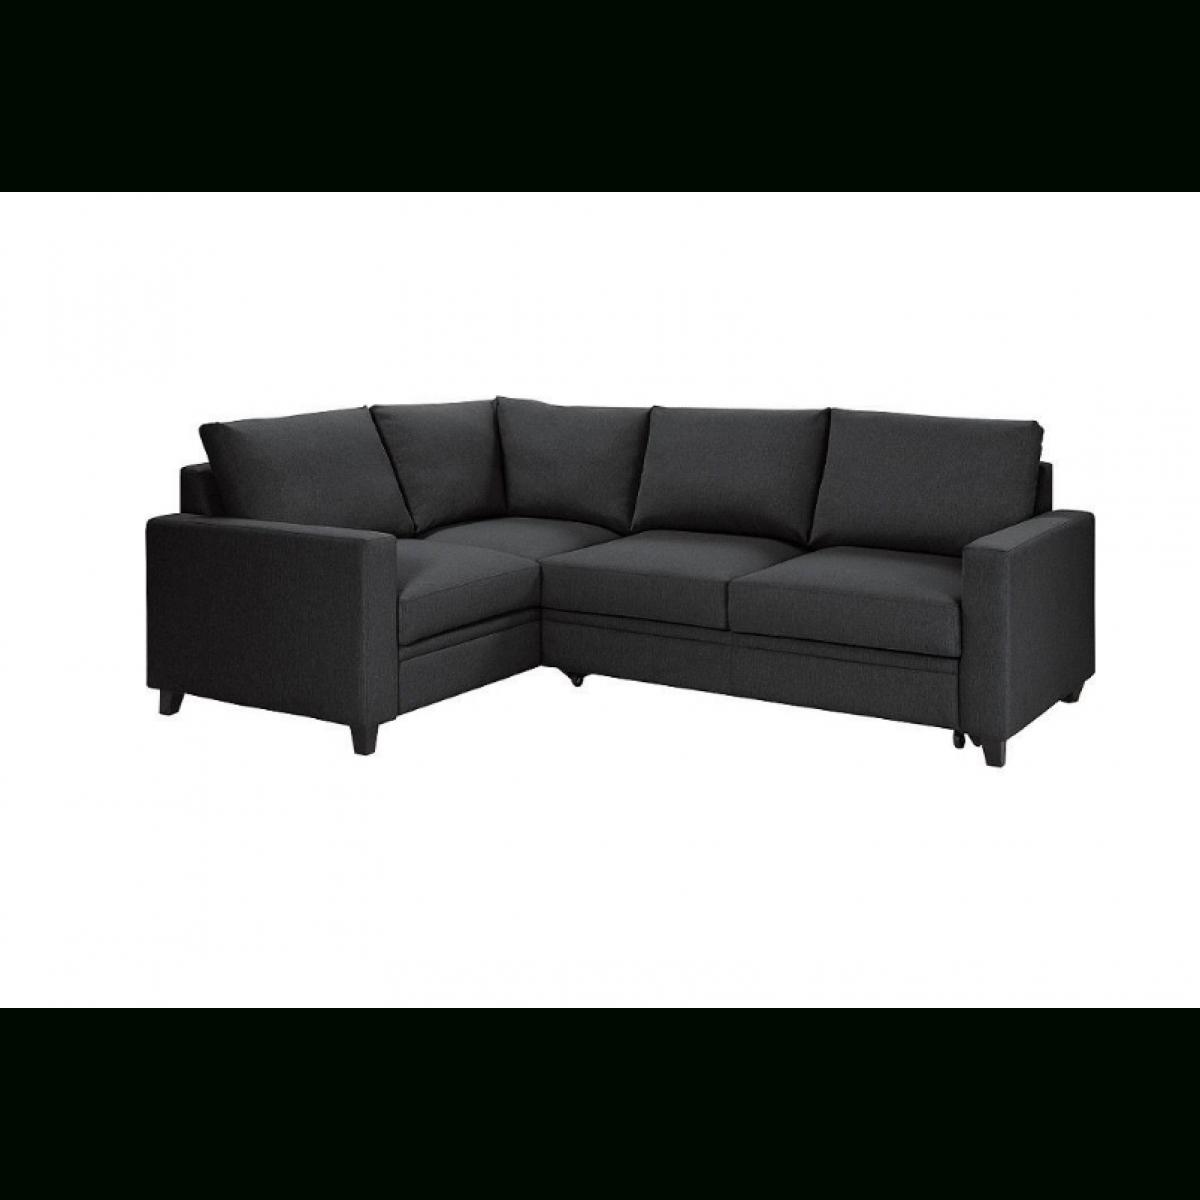 Hygena Seattle Fabric Left Hand Corner Sofa Bed – Charcoal Inside Corner Sofa Beds (View 15 of 20)